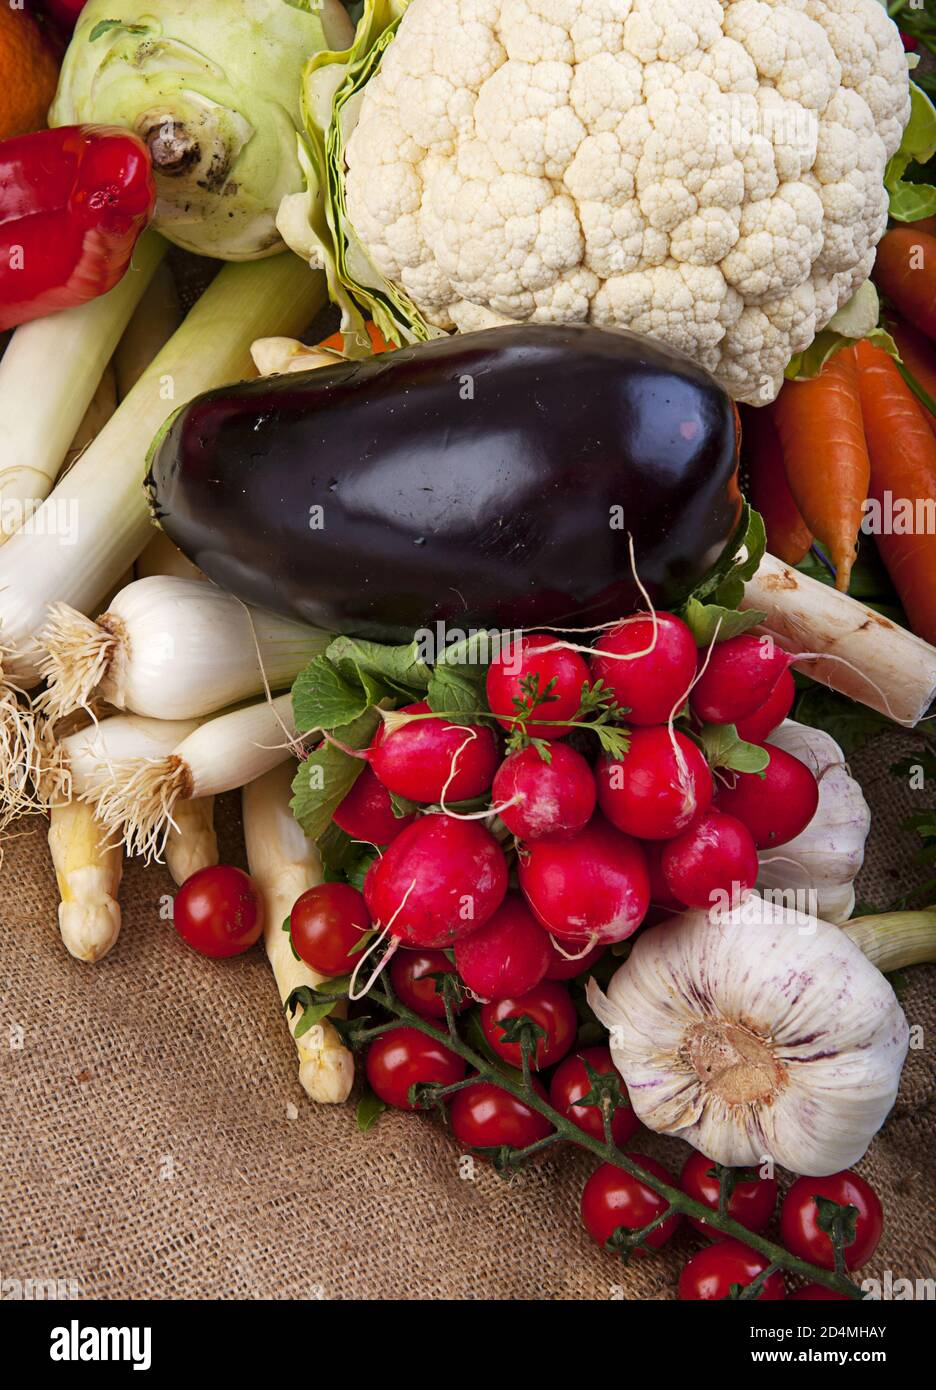 Assortment of various fresh organic vegetables from the garden Stock Photo